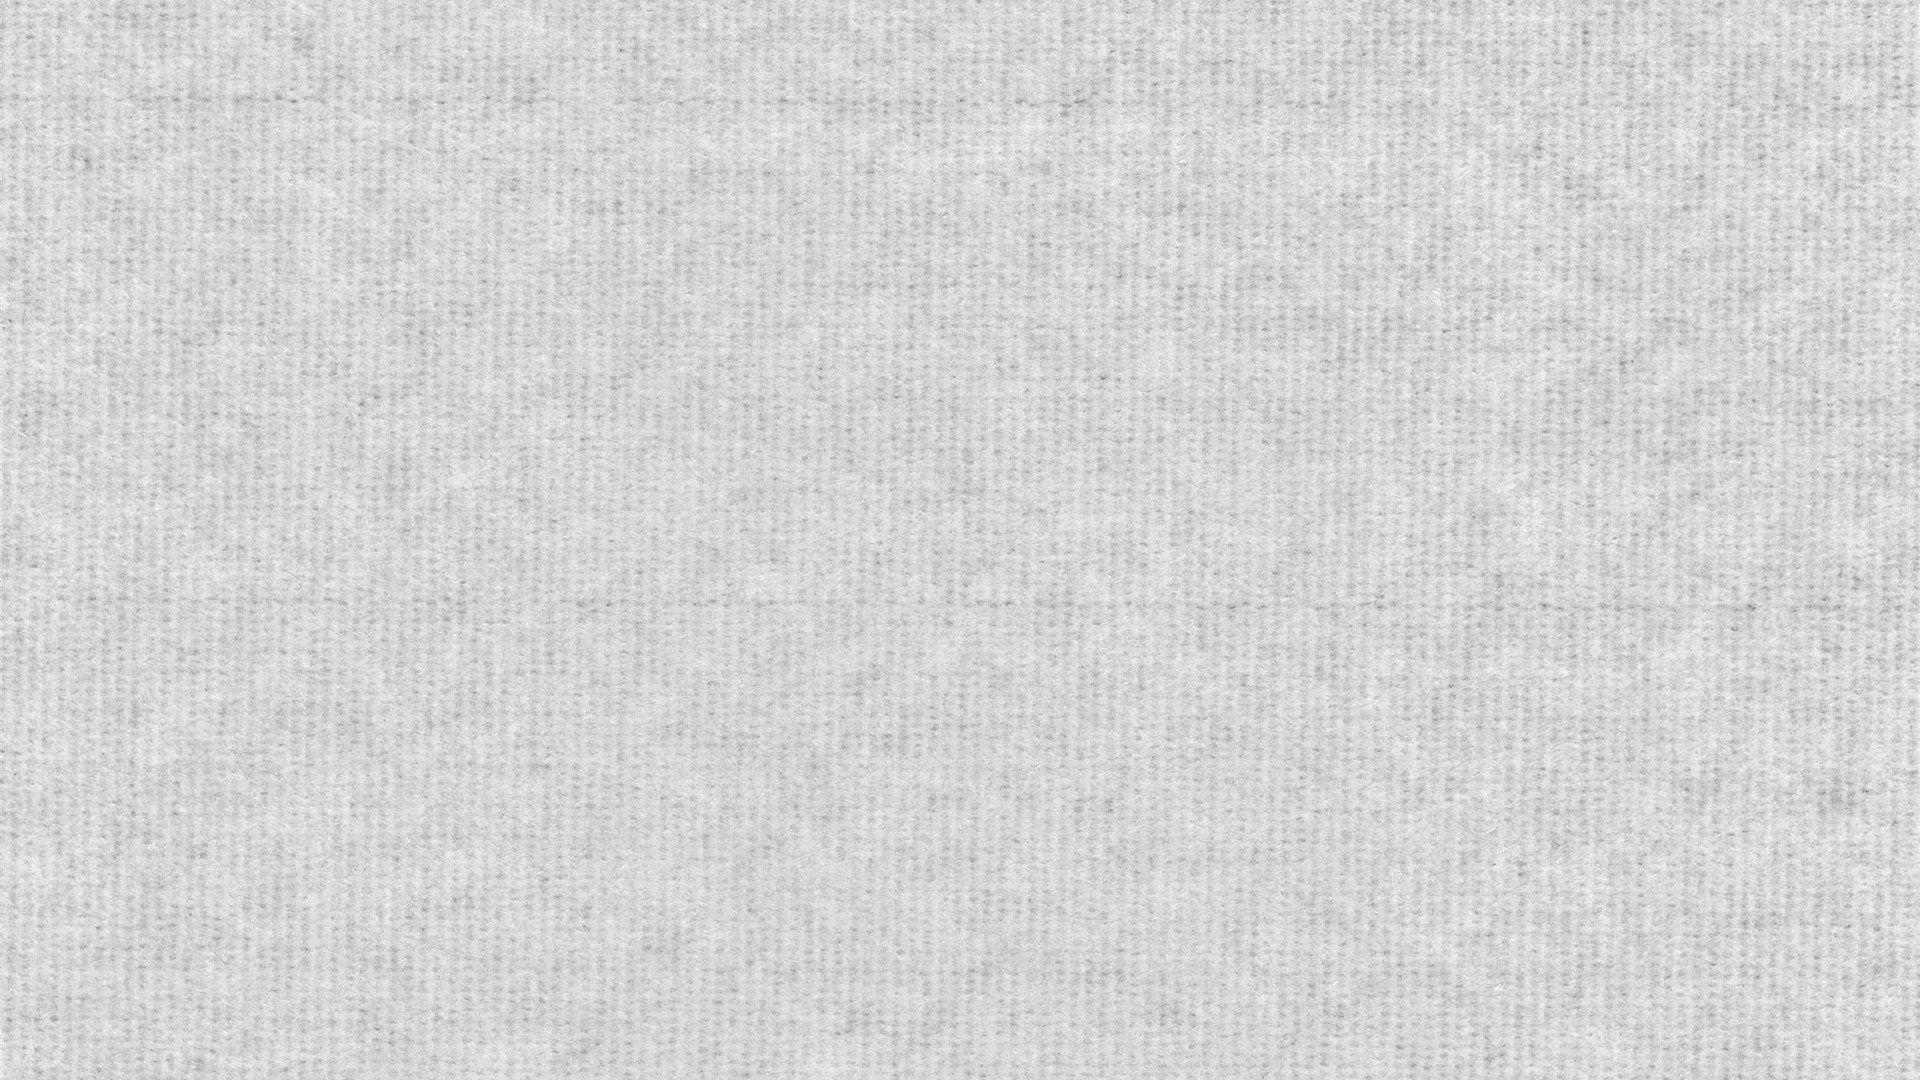 Canvas background image